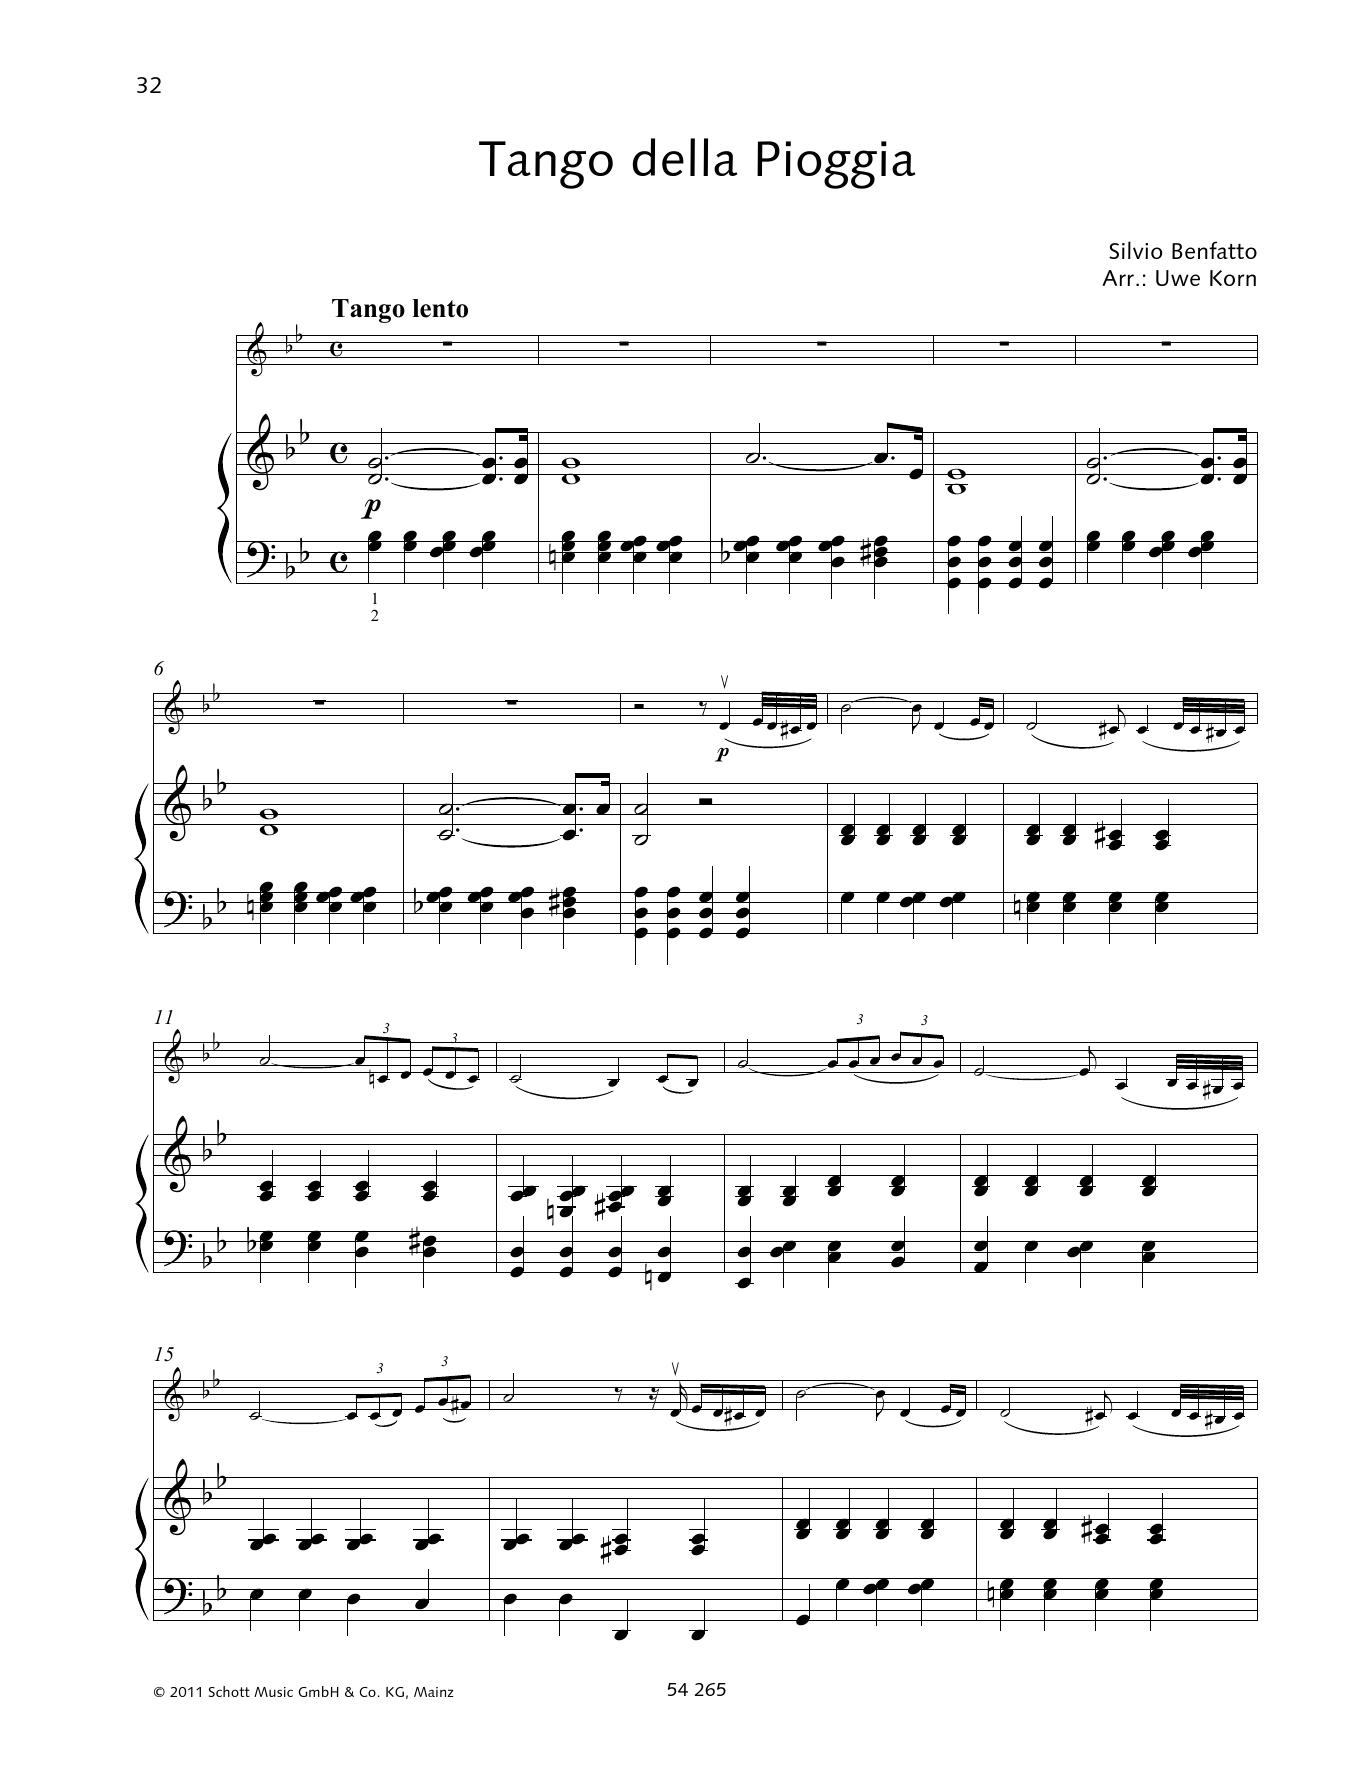 Tango della Piogga Sheet Music